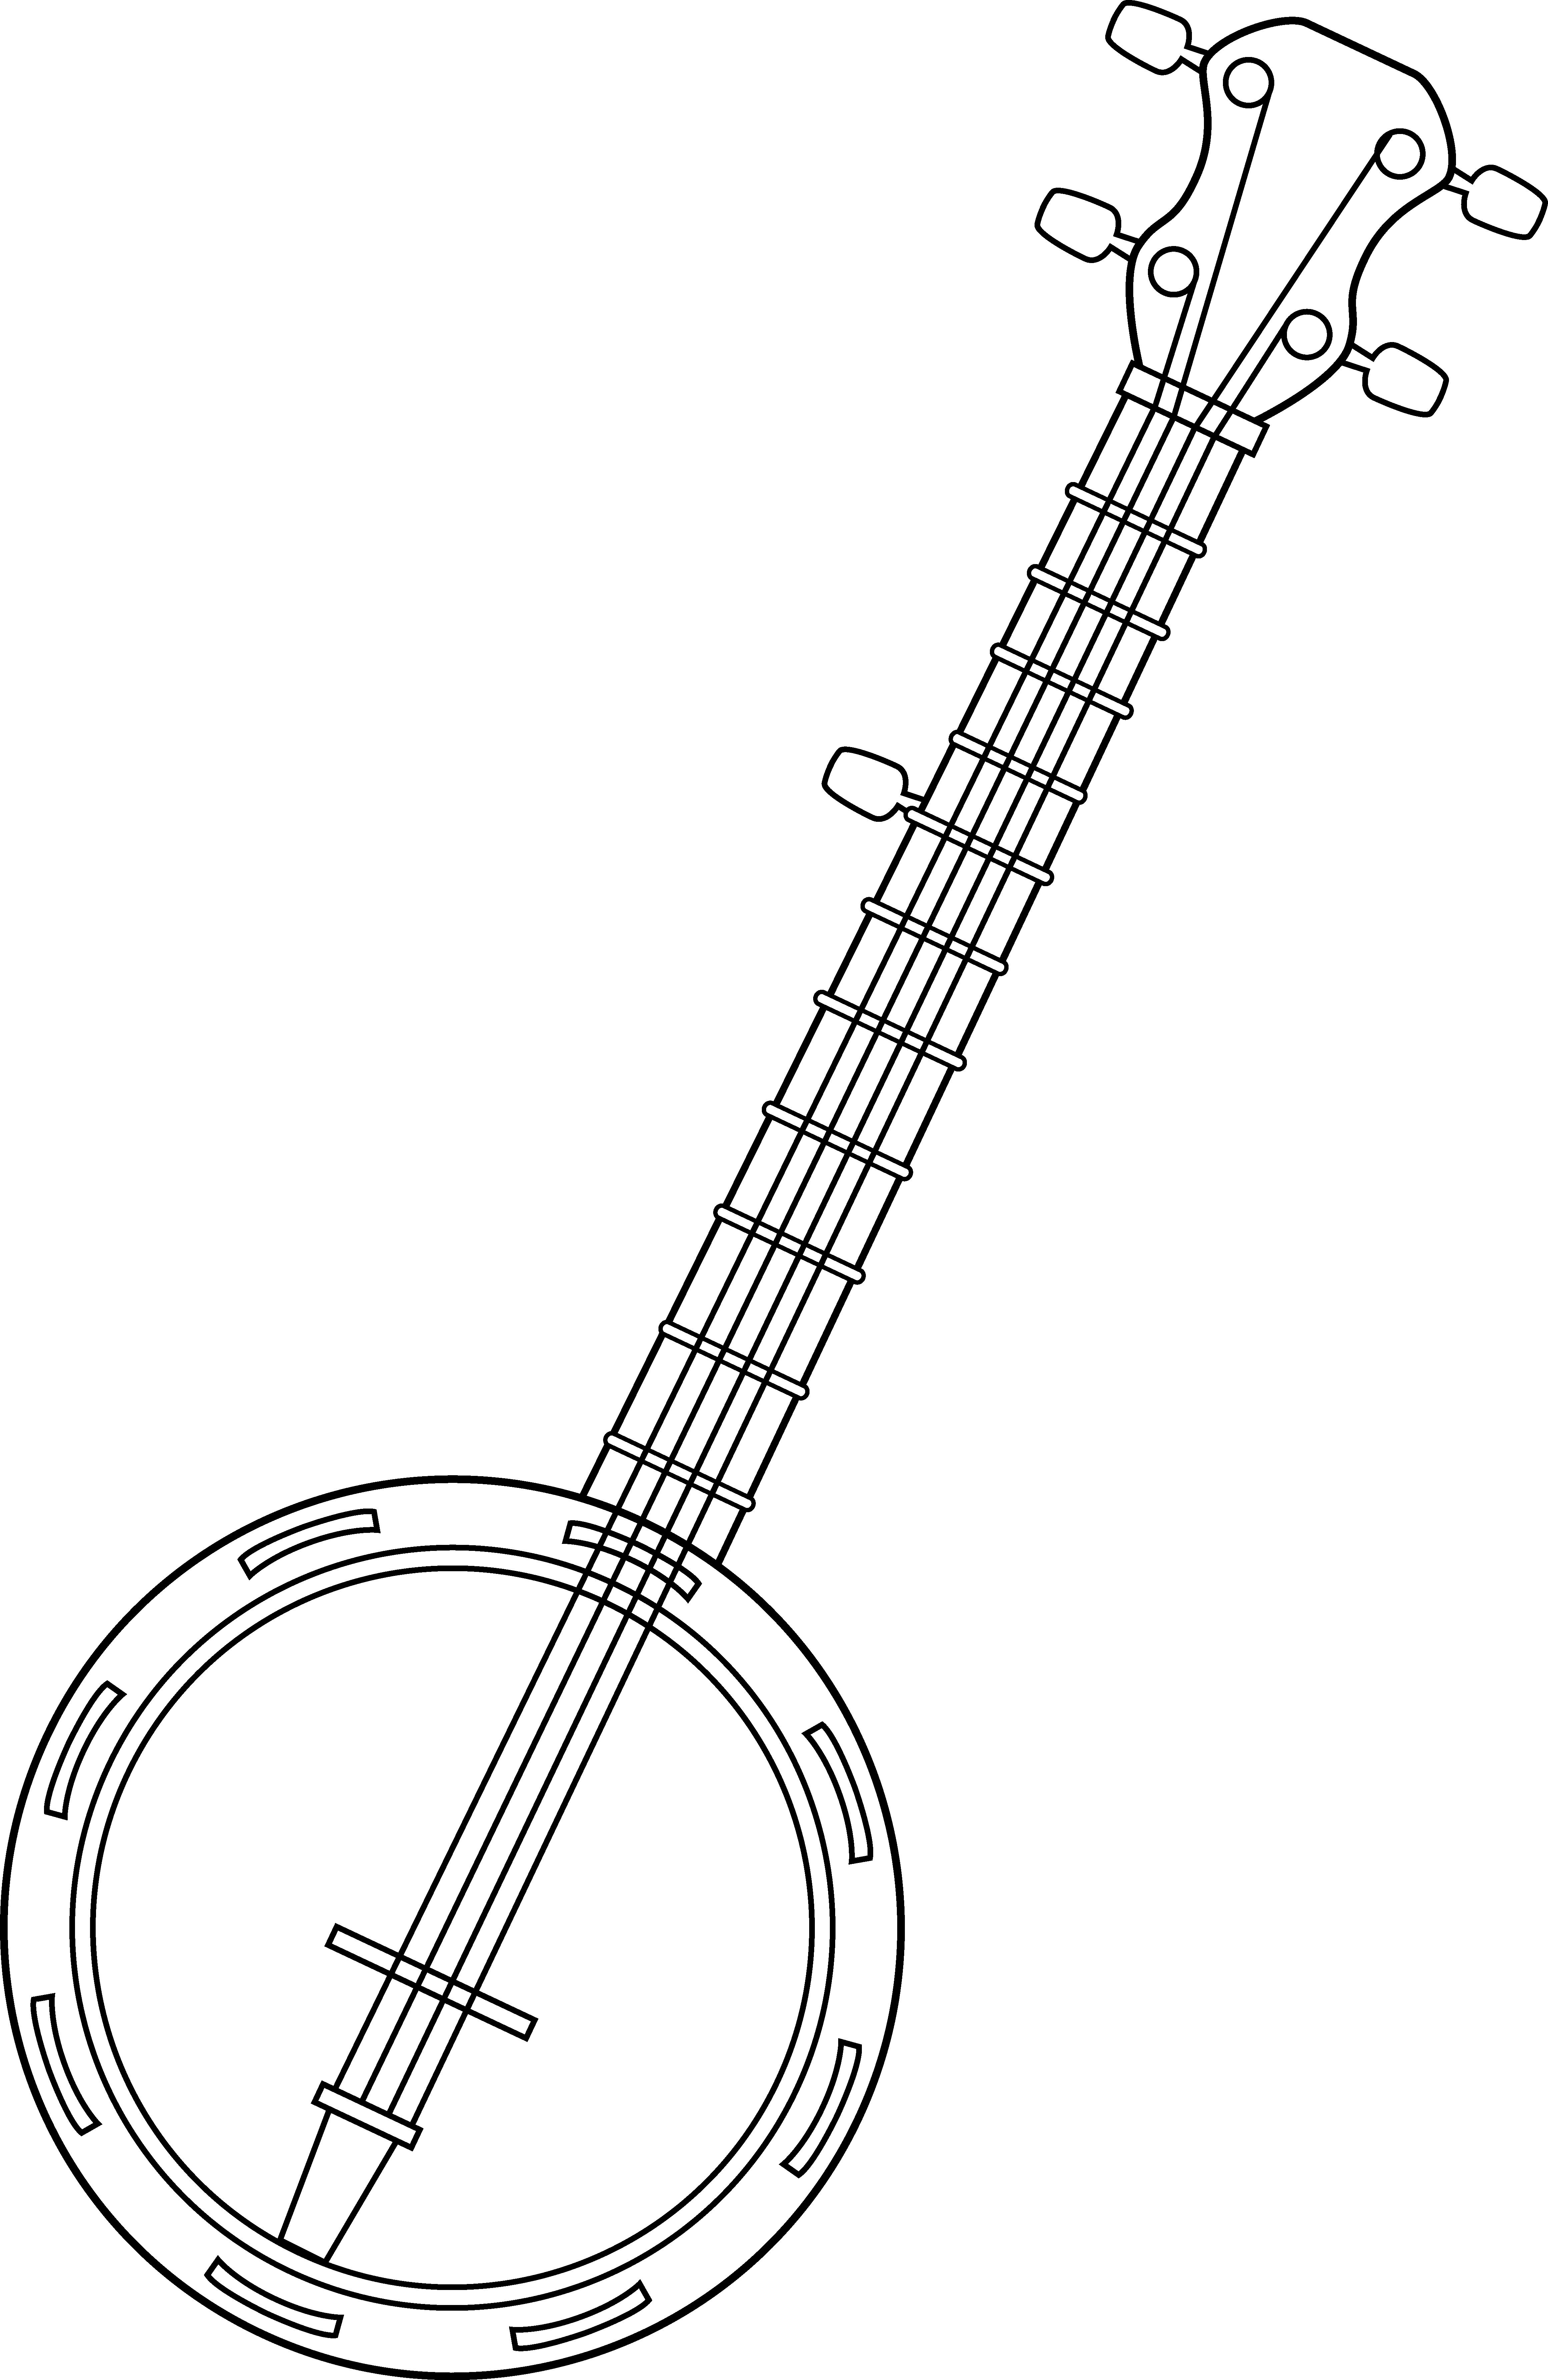 jpg Banjo Colorable Line Art